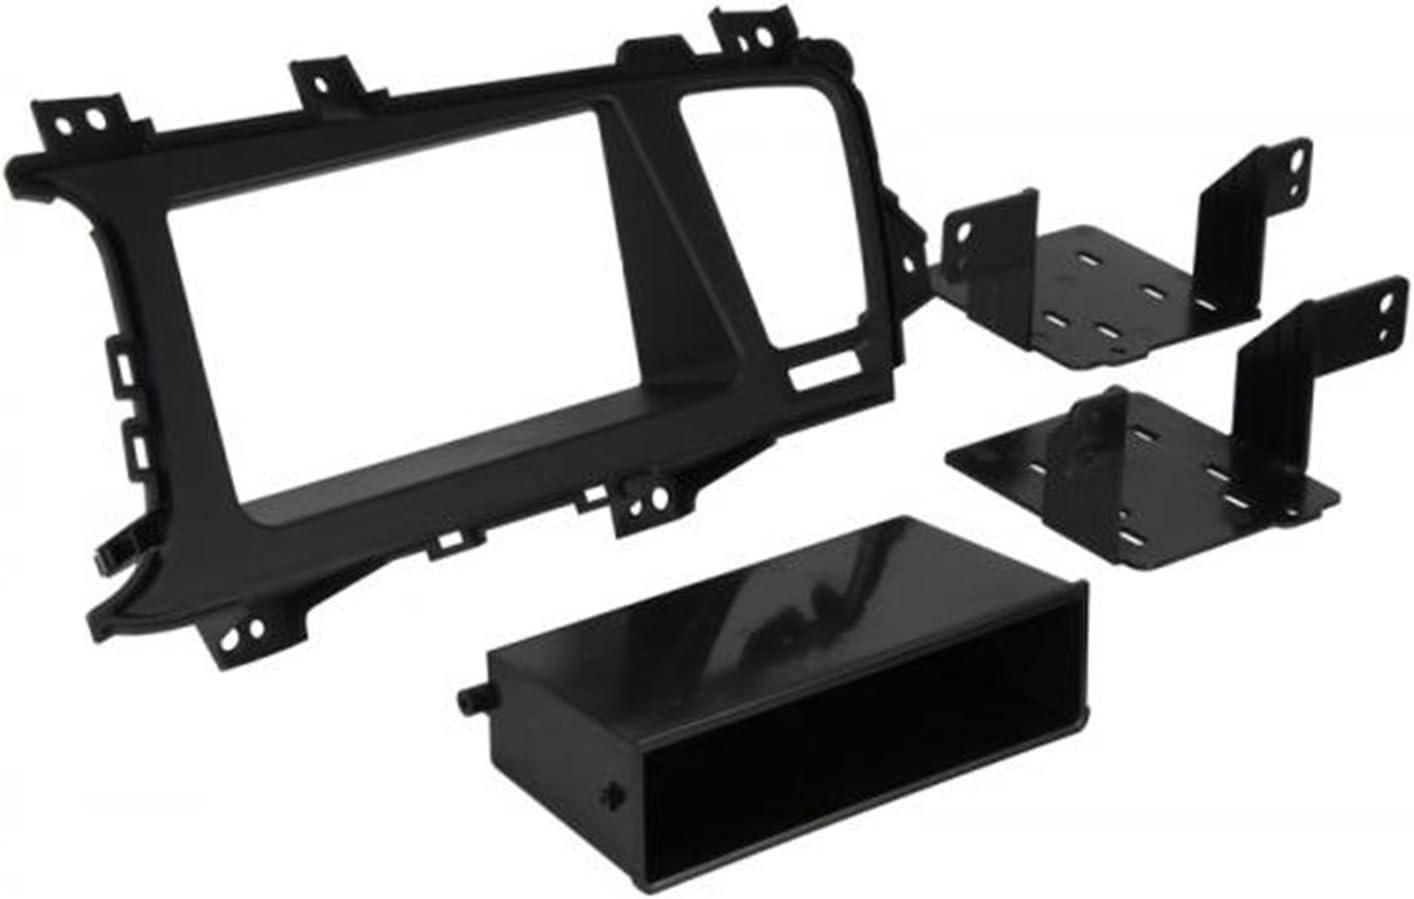 Metra 95-7345B Double DIN Dash Fitment Kit for Kia Optima 2011-Up Black